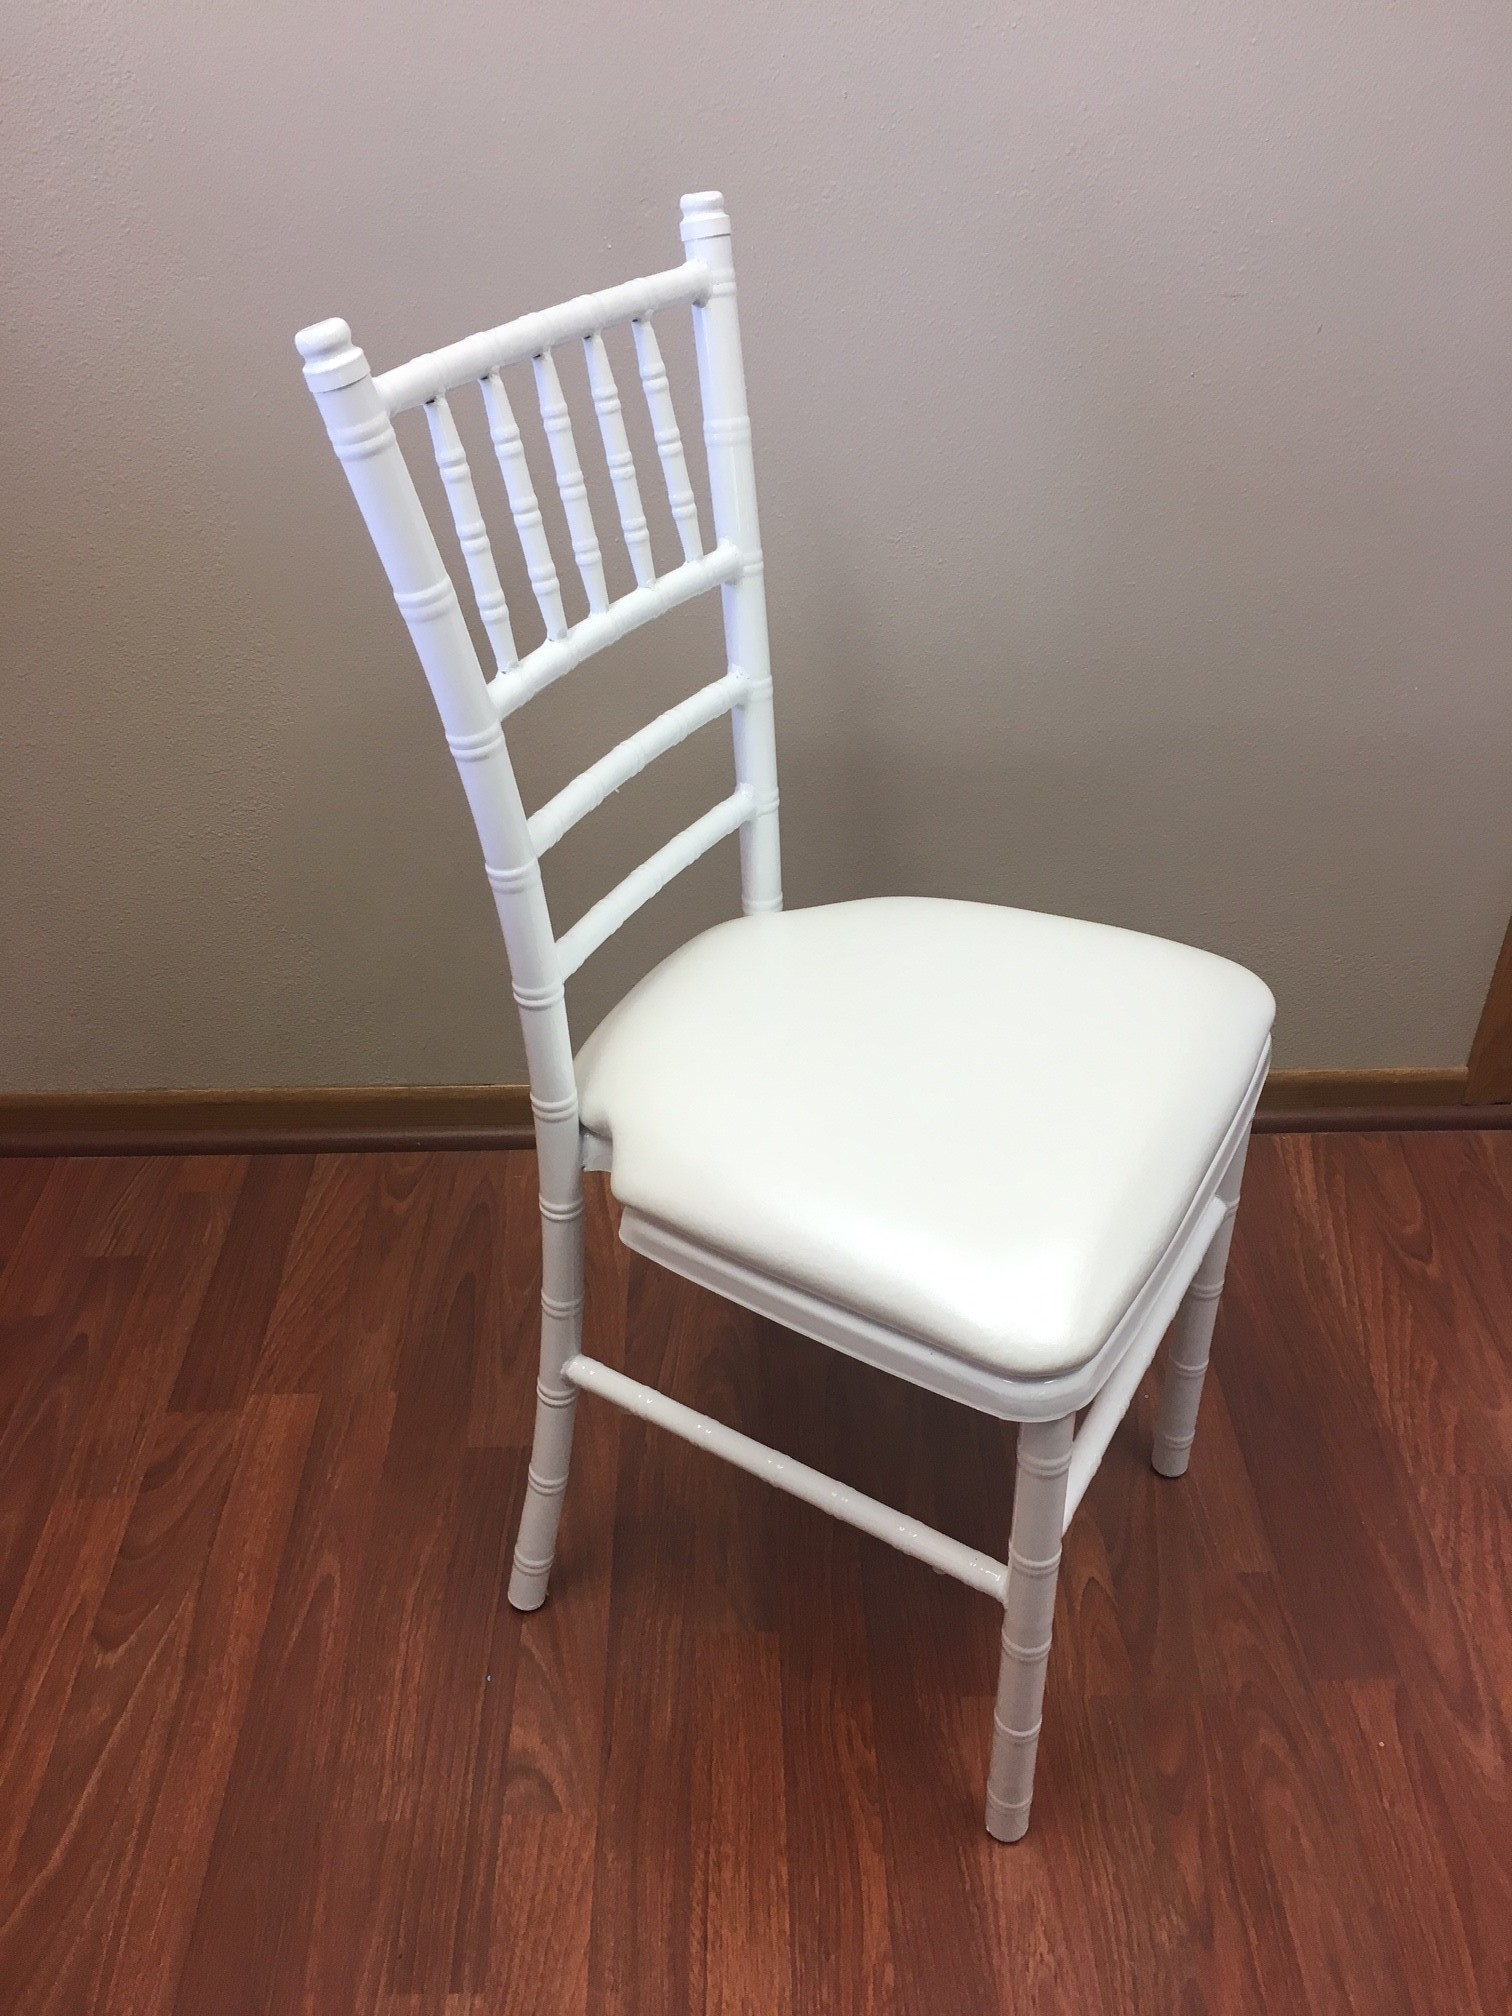 White Aluminum Chiavari Chair Rental WhiteAluminum  Chiavari Chair Rentals